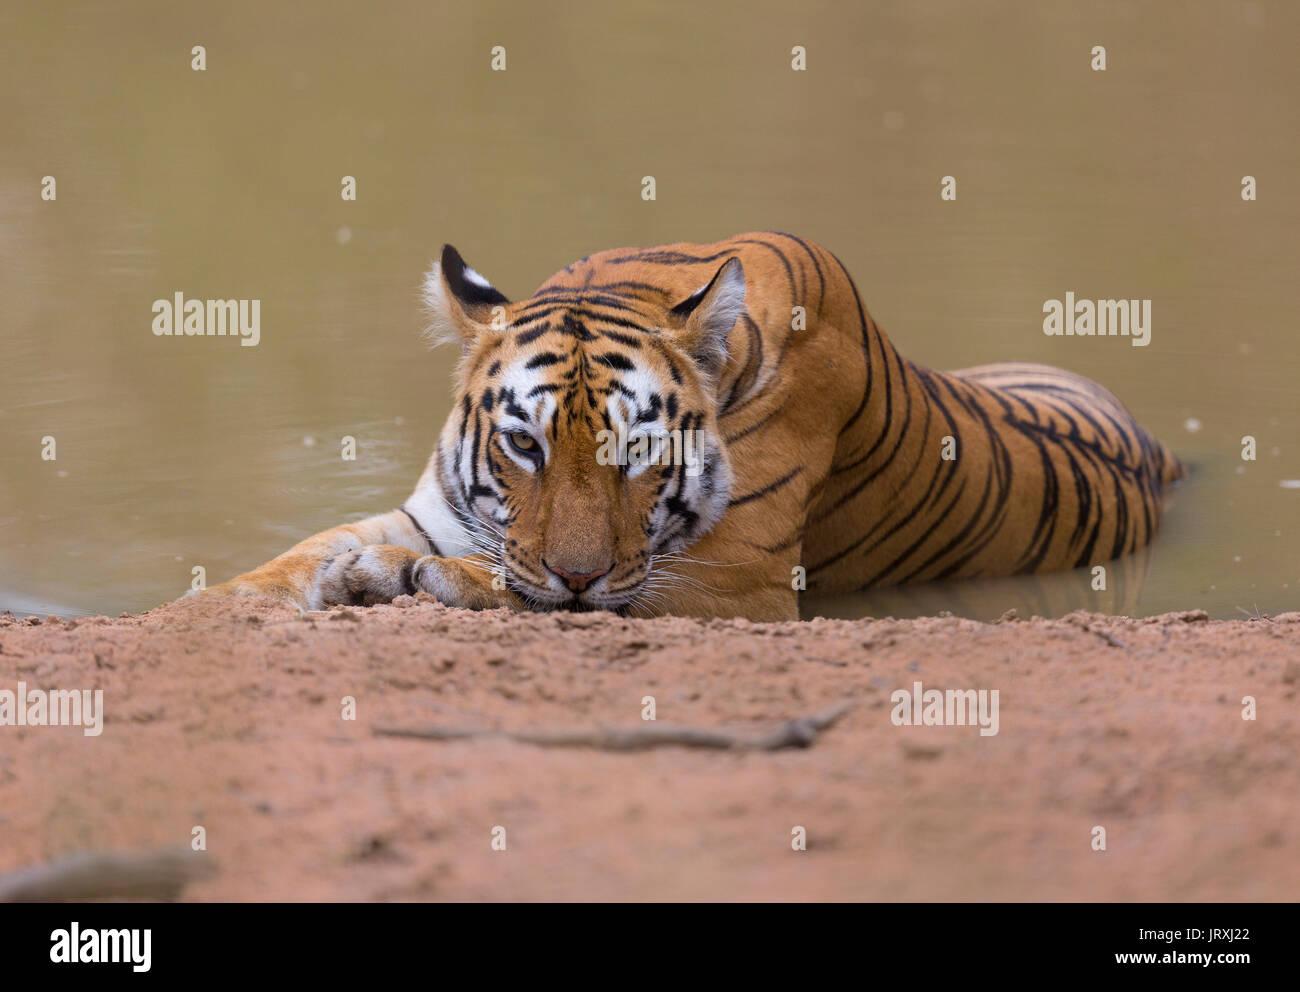 Royal Bengal Tiger or Panthera tigris tigris or Indian Tiger relaxing on the water in Tadoba National park, Maharashtra, India - Stock Image